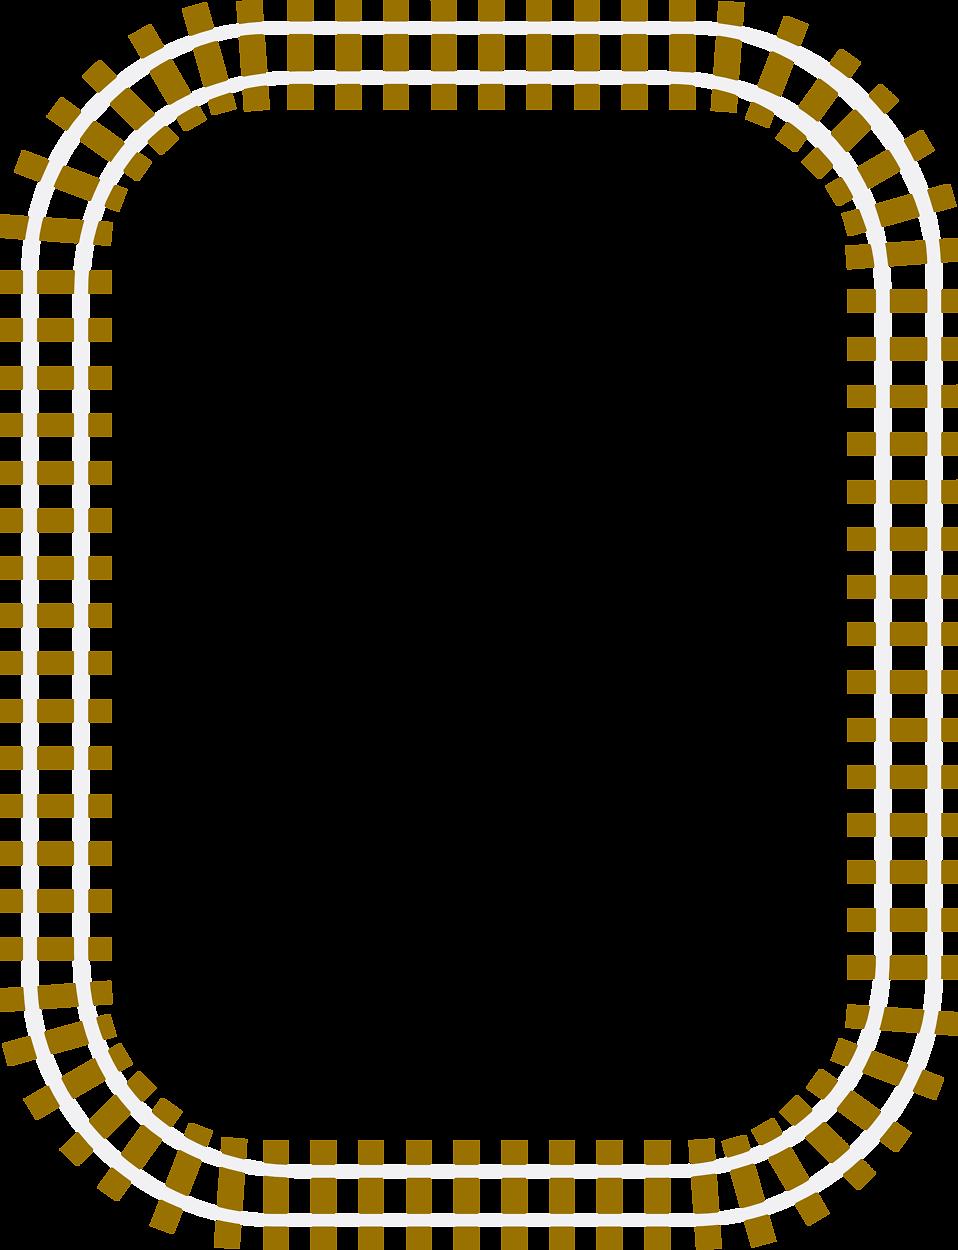 Illustration of a blank railroad track frame border : Free.